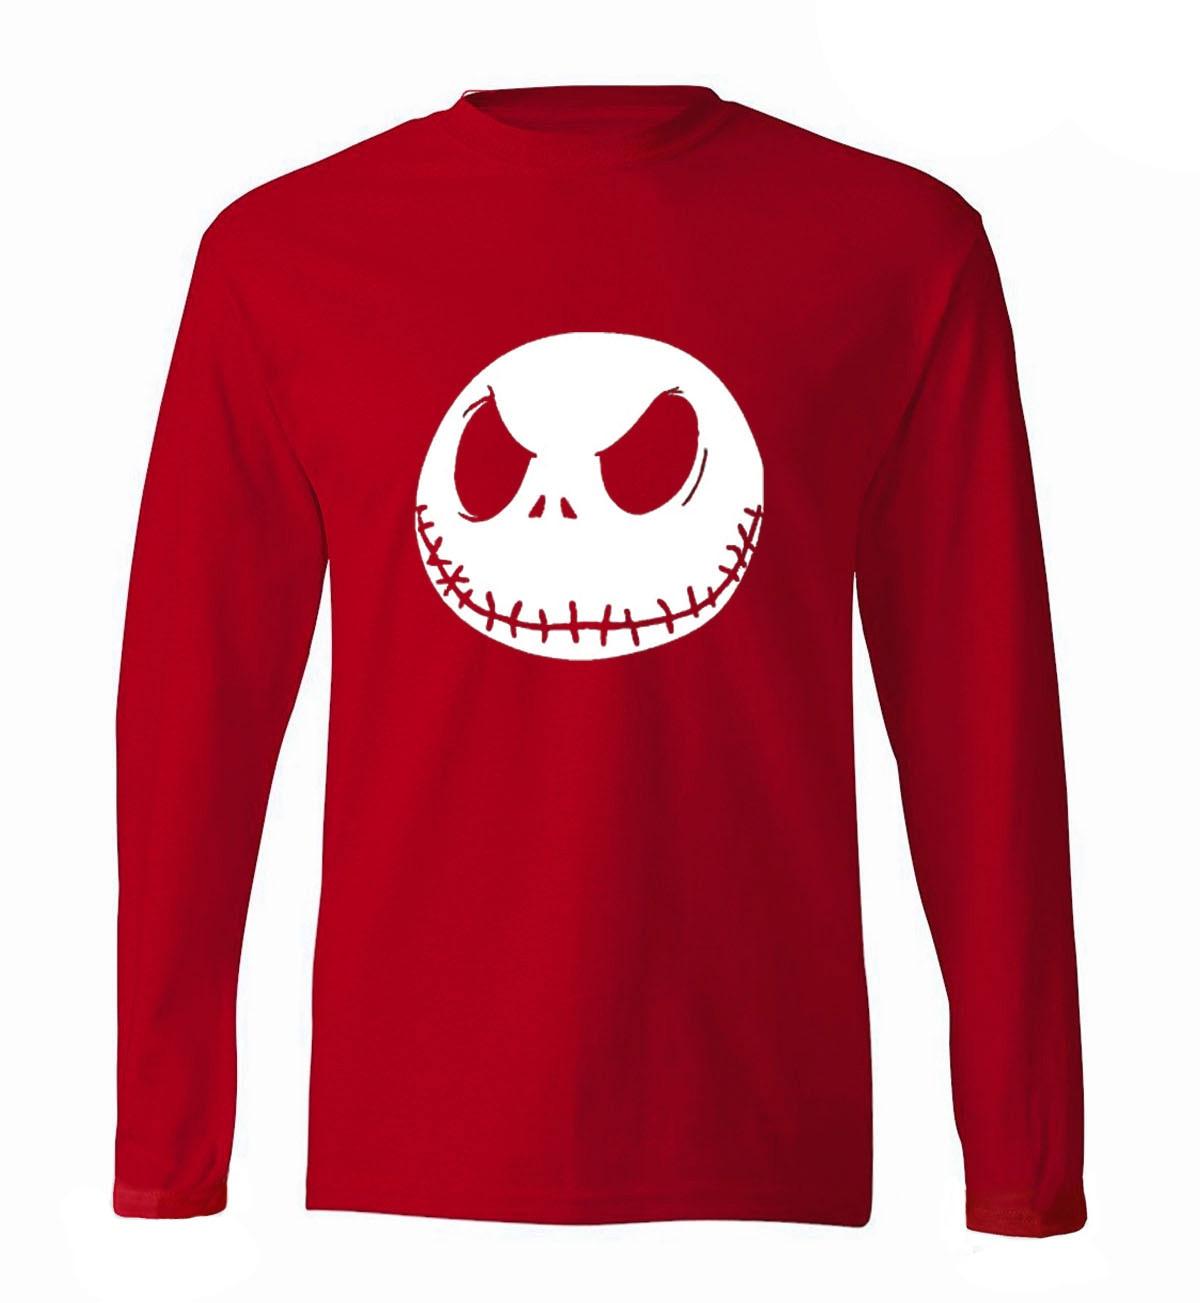 Hot Sale Nightmare Before Christmas Jack Skellington Men Long Sleeve T Shirt 2019 new spring 100% cotton hipster man t-shirt